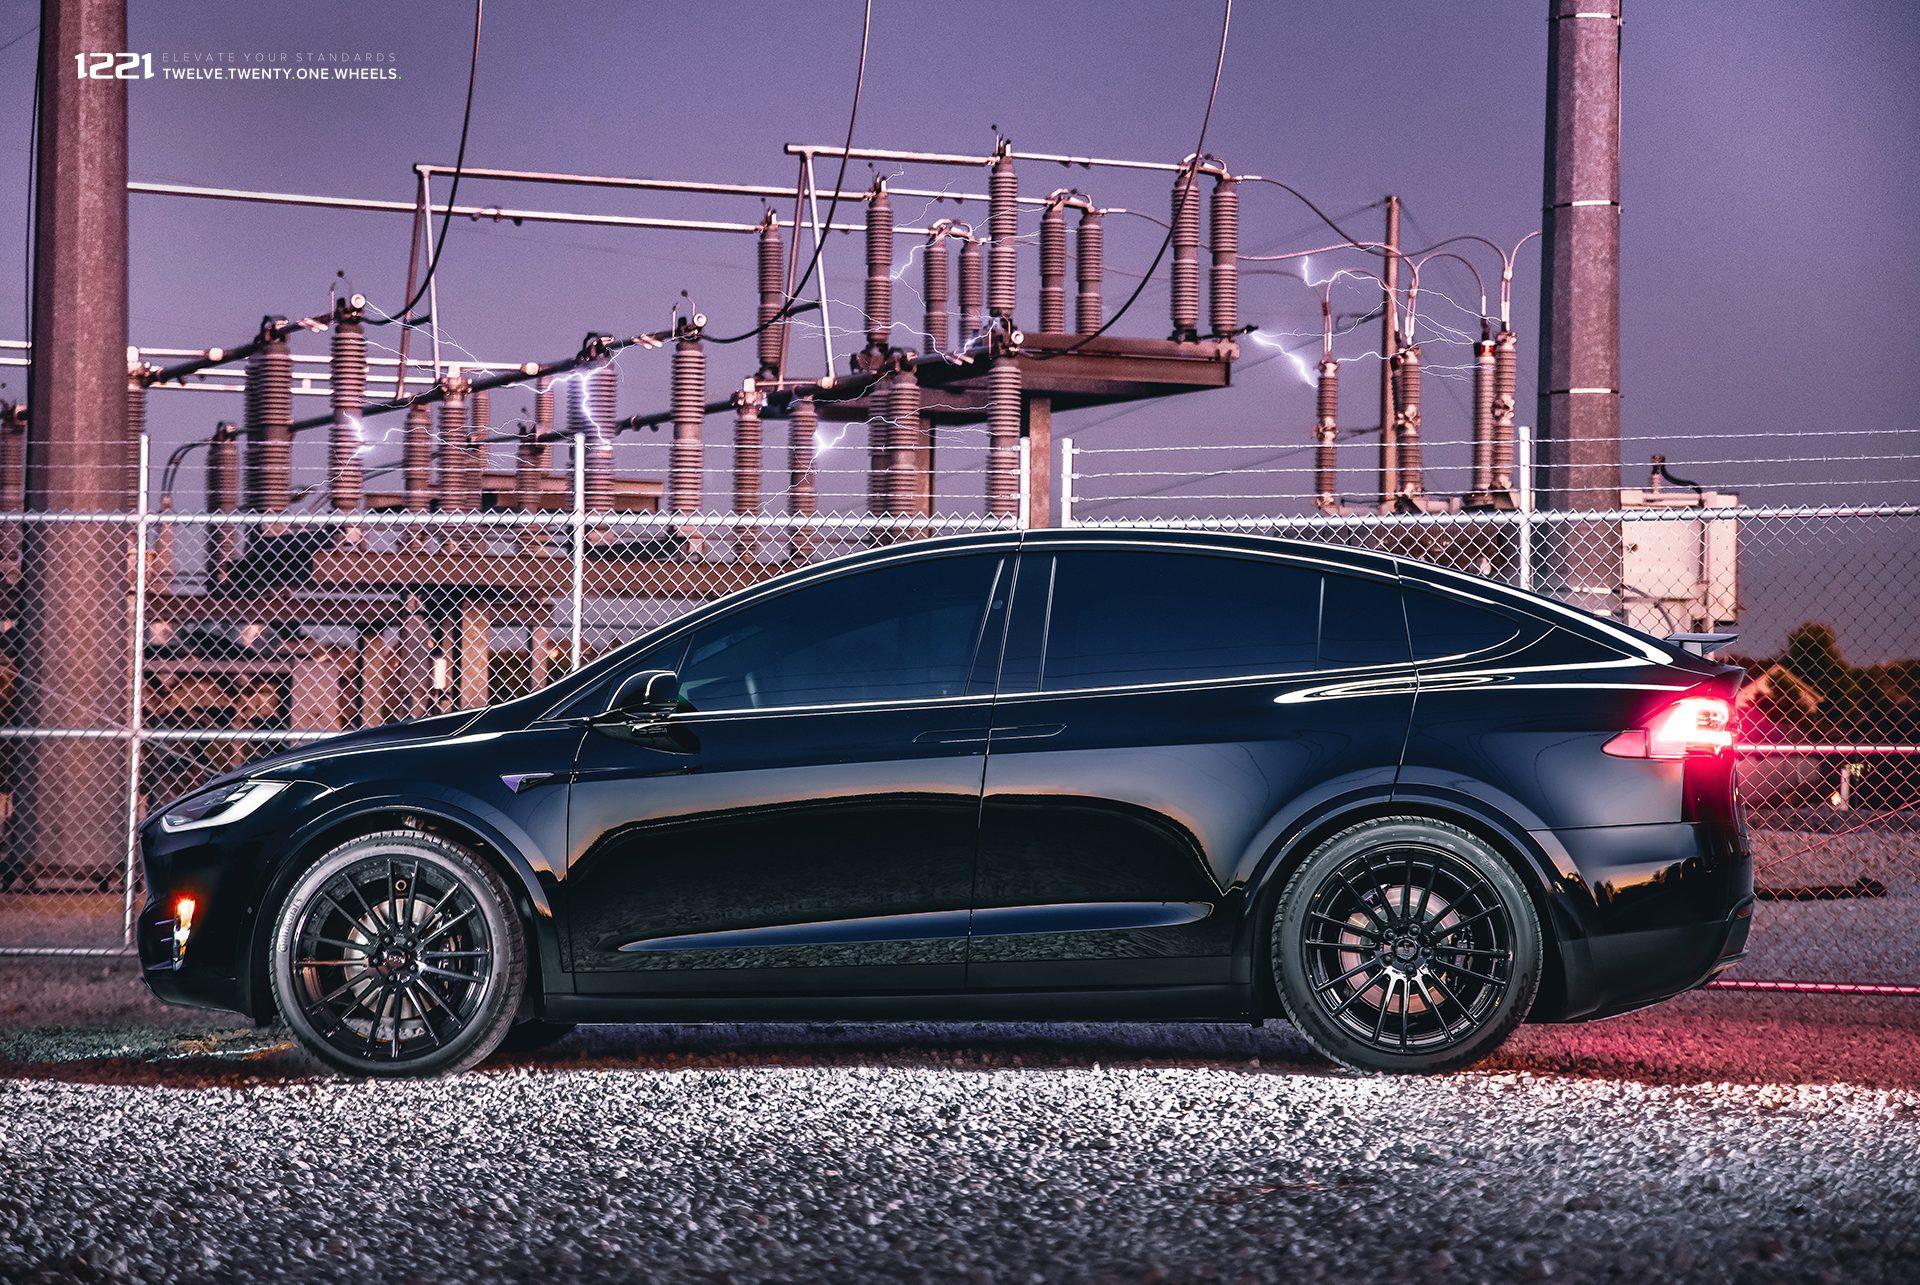 1221 Wheels Tesla Model X Suv 1441 Ap2 Apex3 0